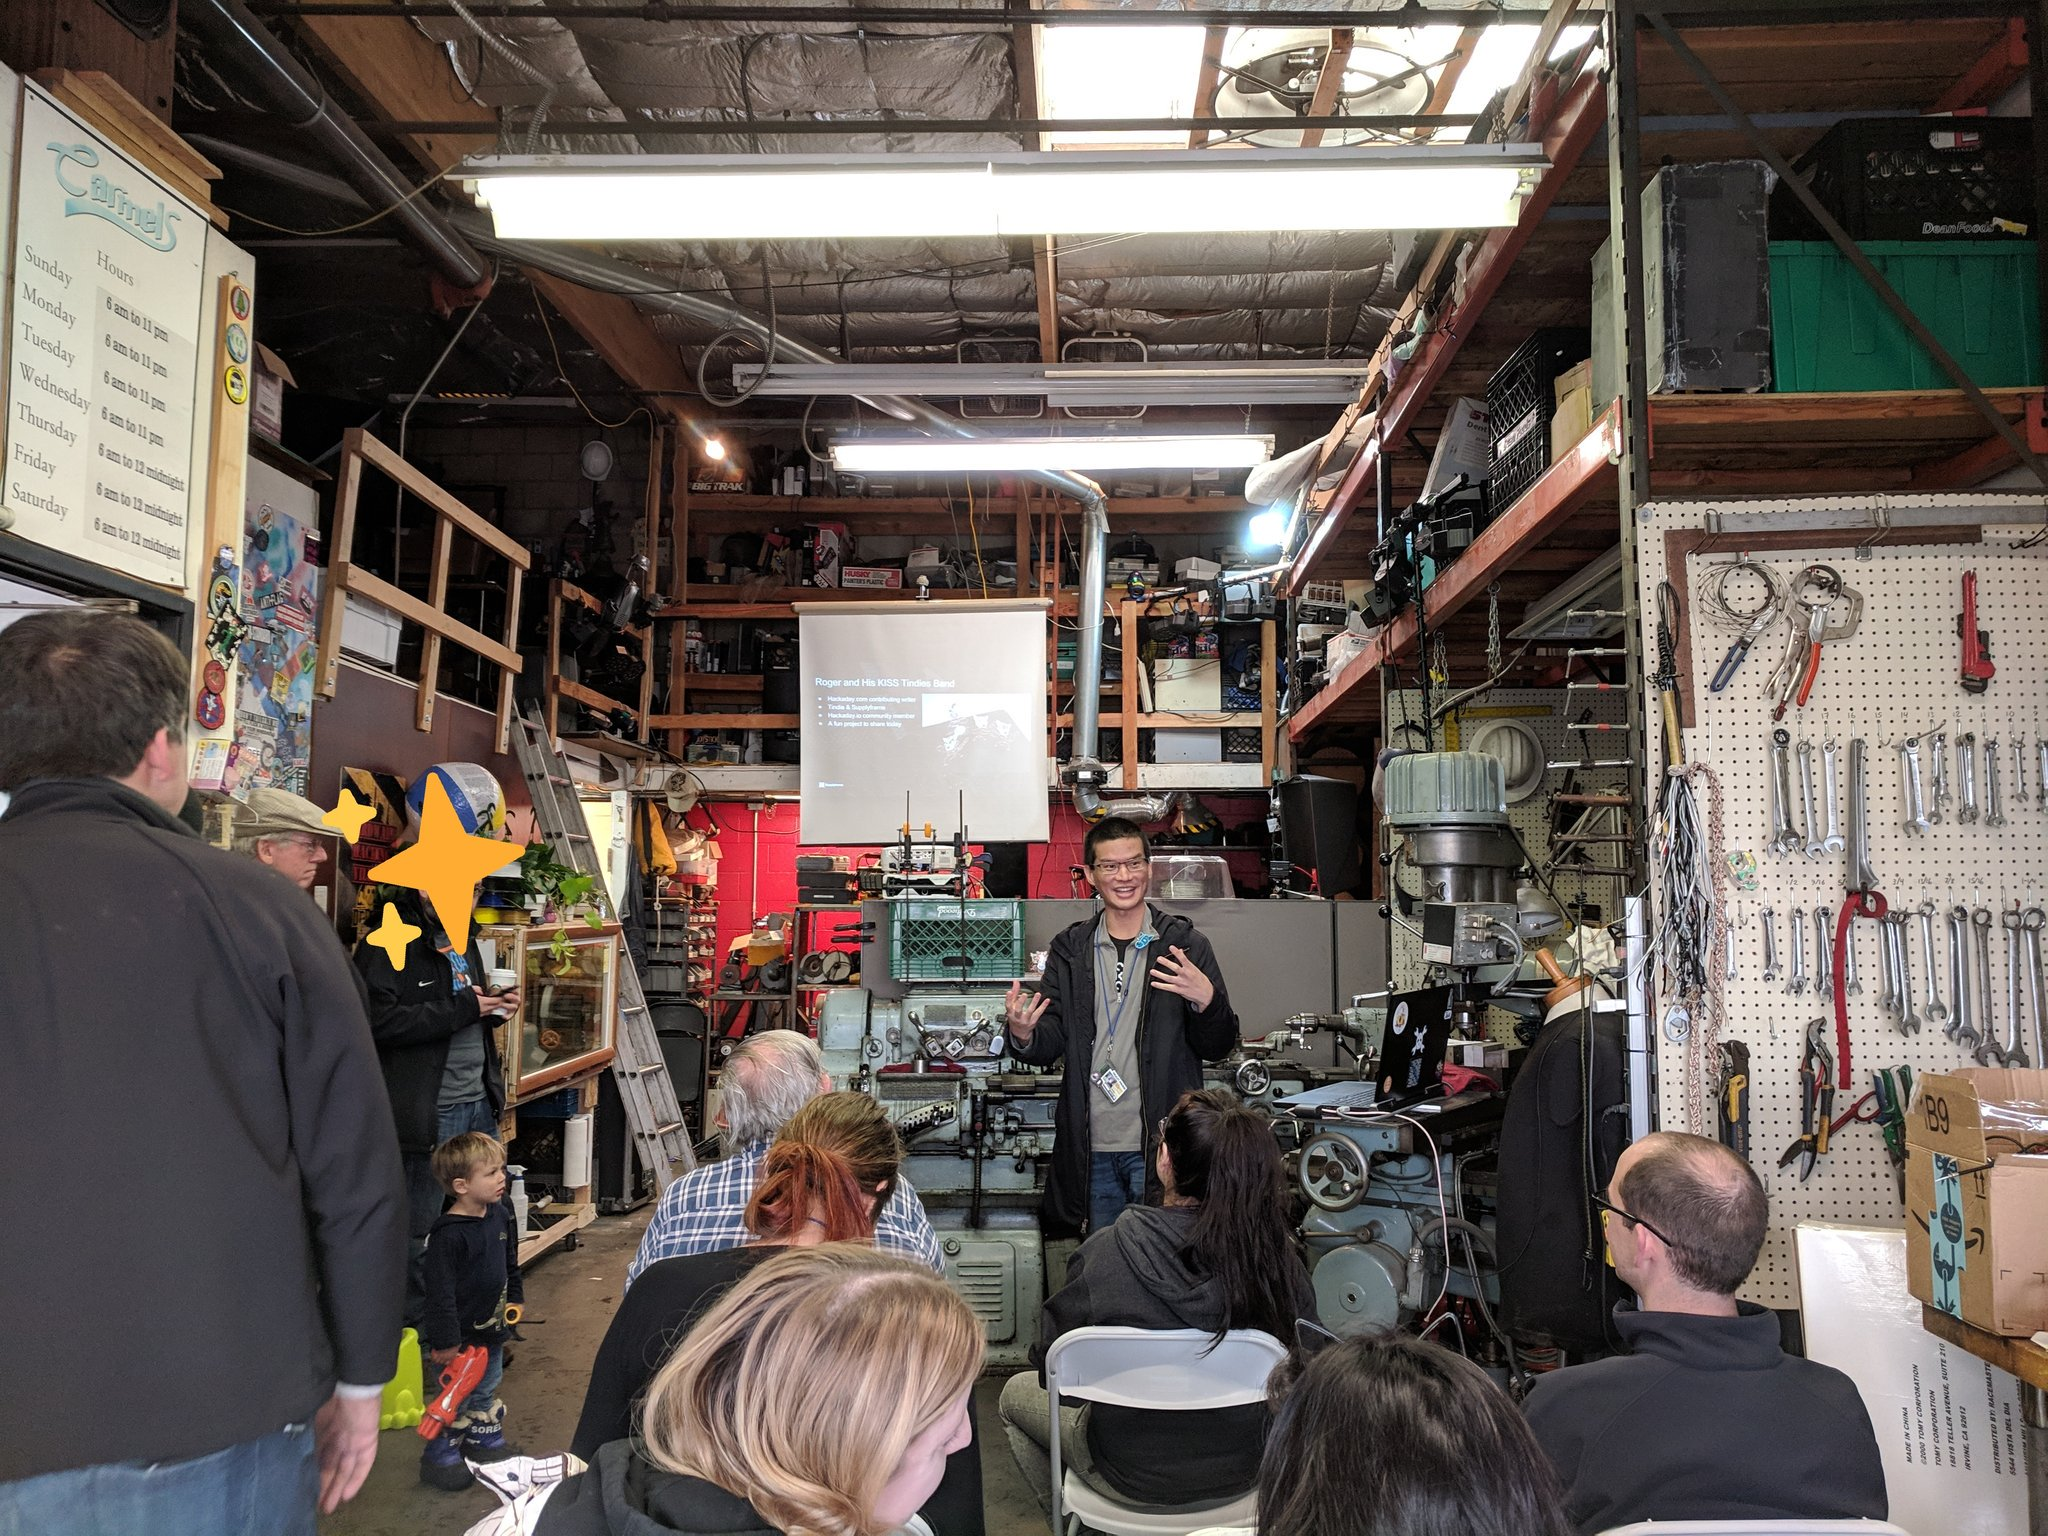 Roger presenting at Sparklecon - Drew Fustini